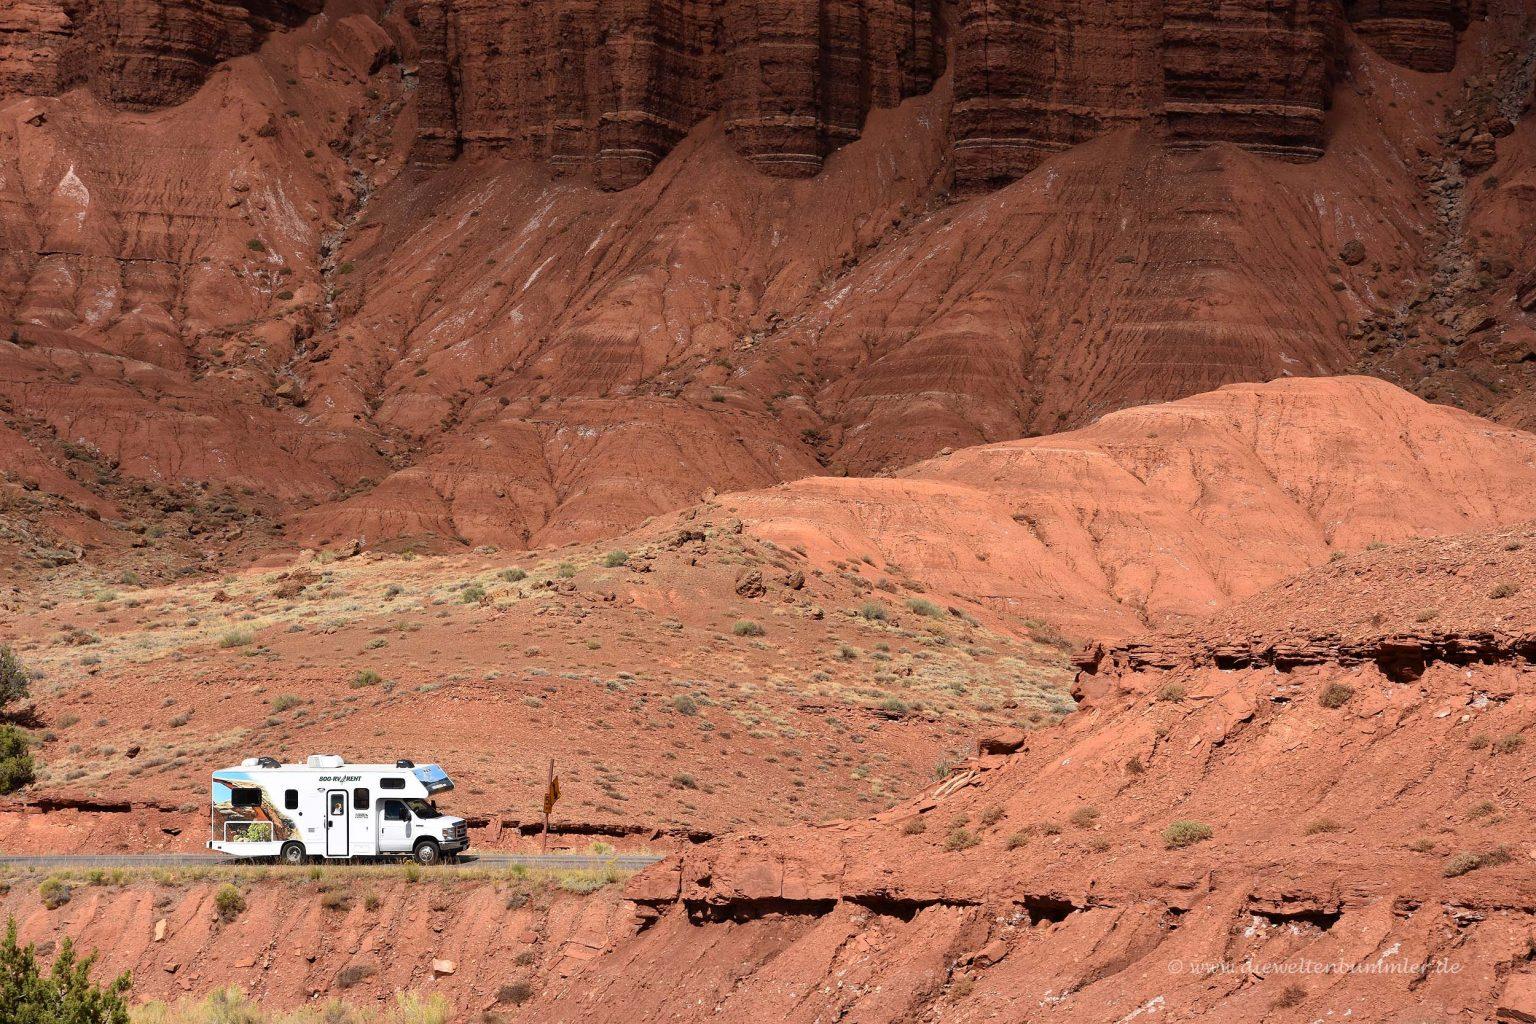 Mietwohnmobil im US-Nationalpark